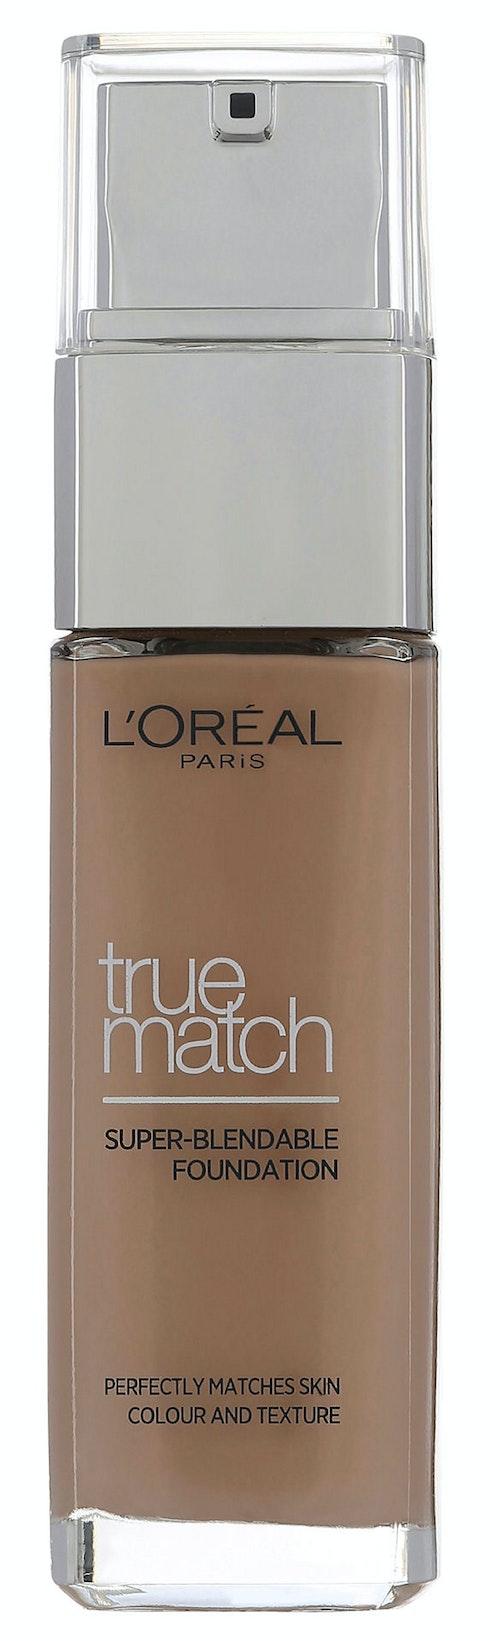 L'Oreal True Match Beige Rose 3R/3C Foundation 1 stk